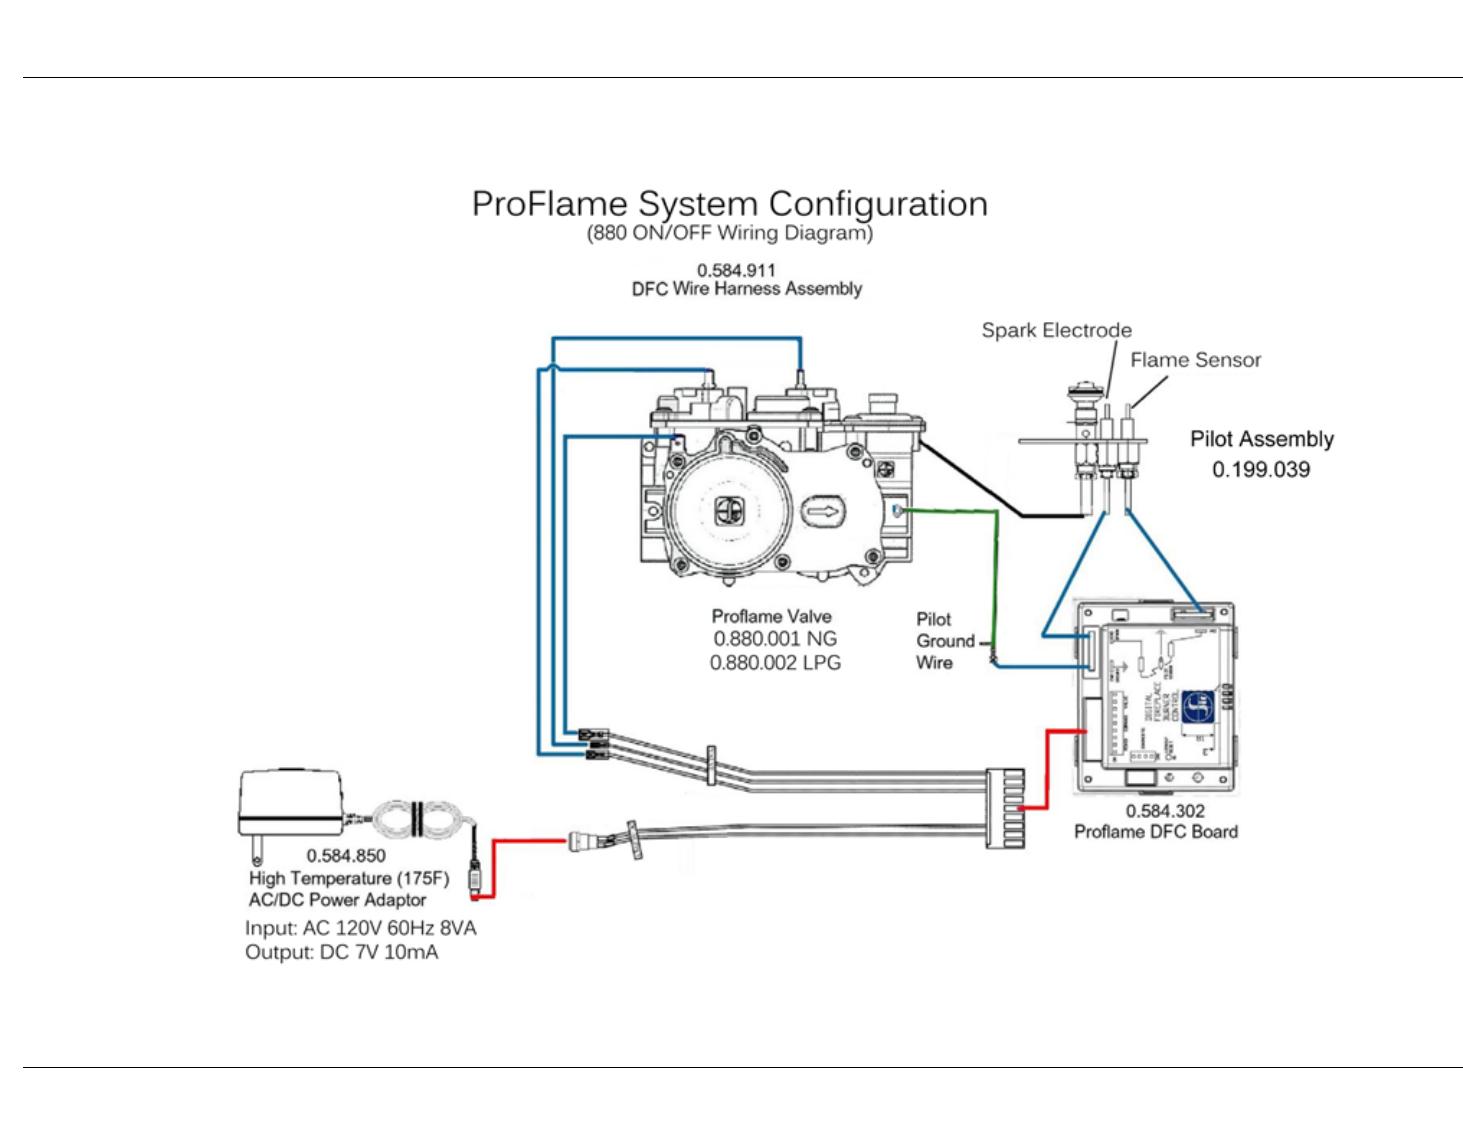 Paloform Robata Outdoor Burner Manual Sml Flame Sensor Wiring Diagram 14robata Owner And Installation